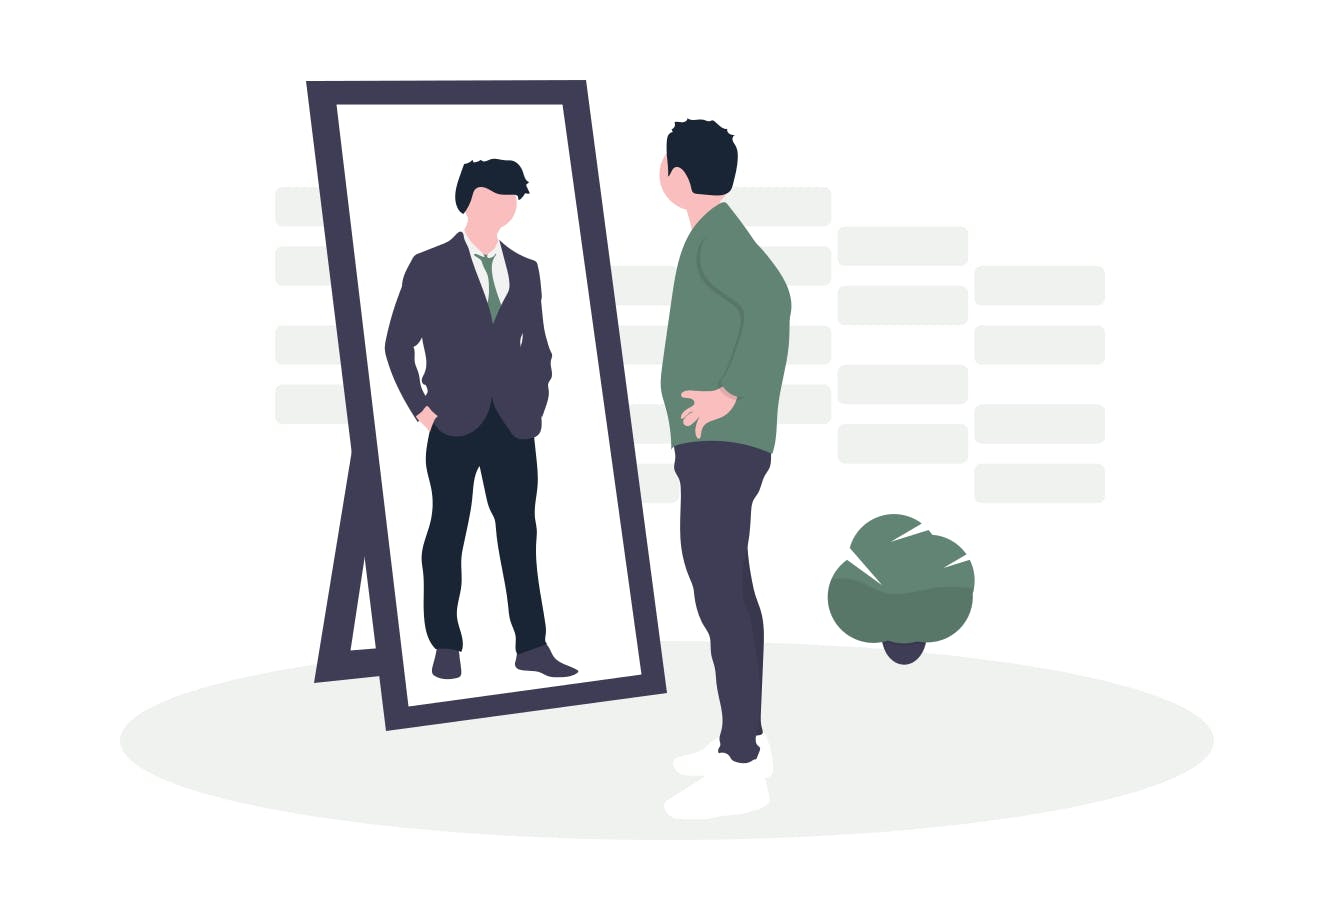 undraw_career_progress_ivdb.png